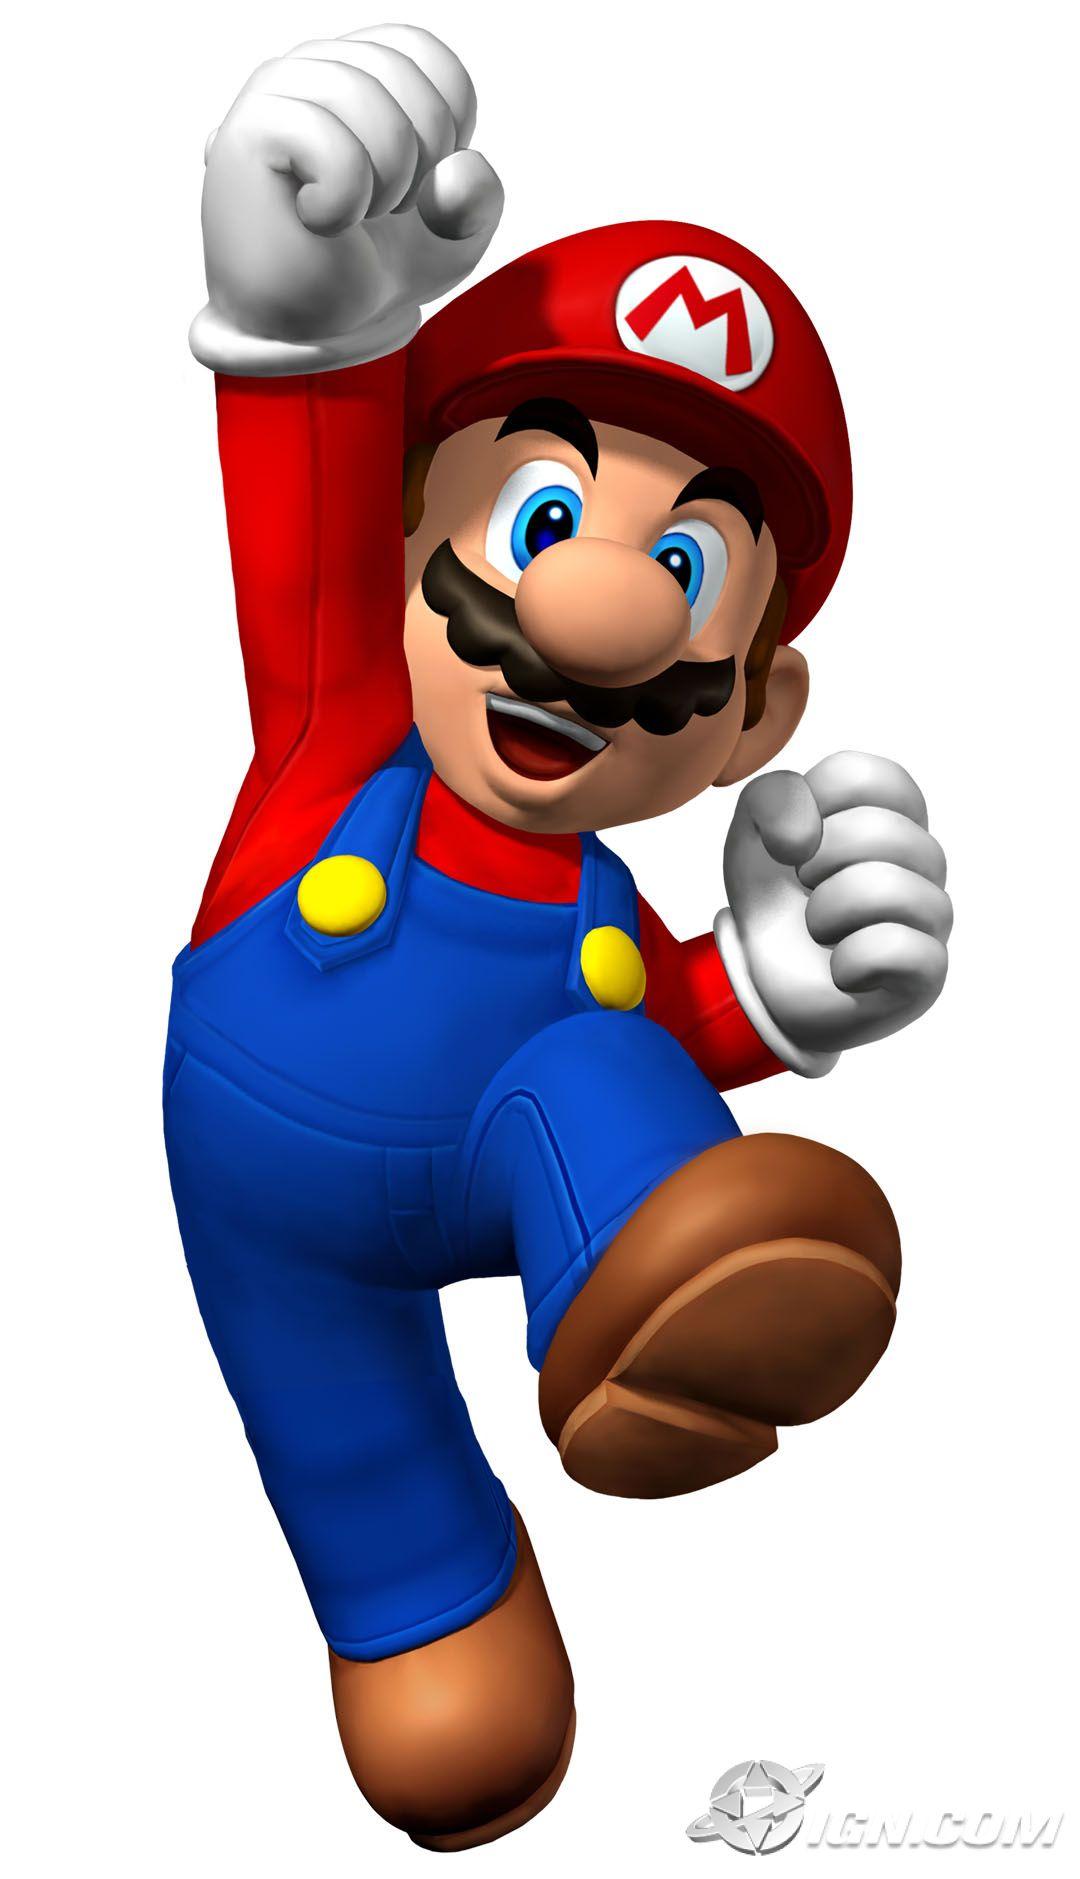 تحميل لعبة سوبر ماريو New-super-mario-bros